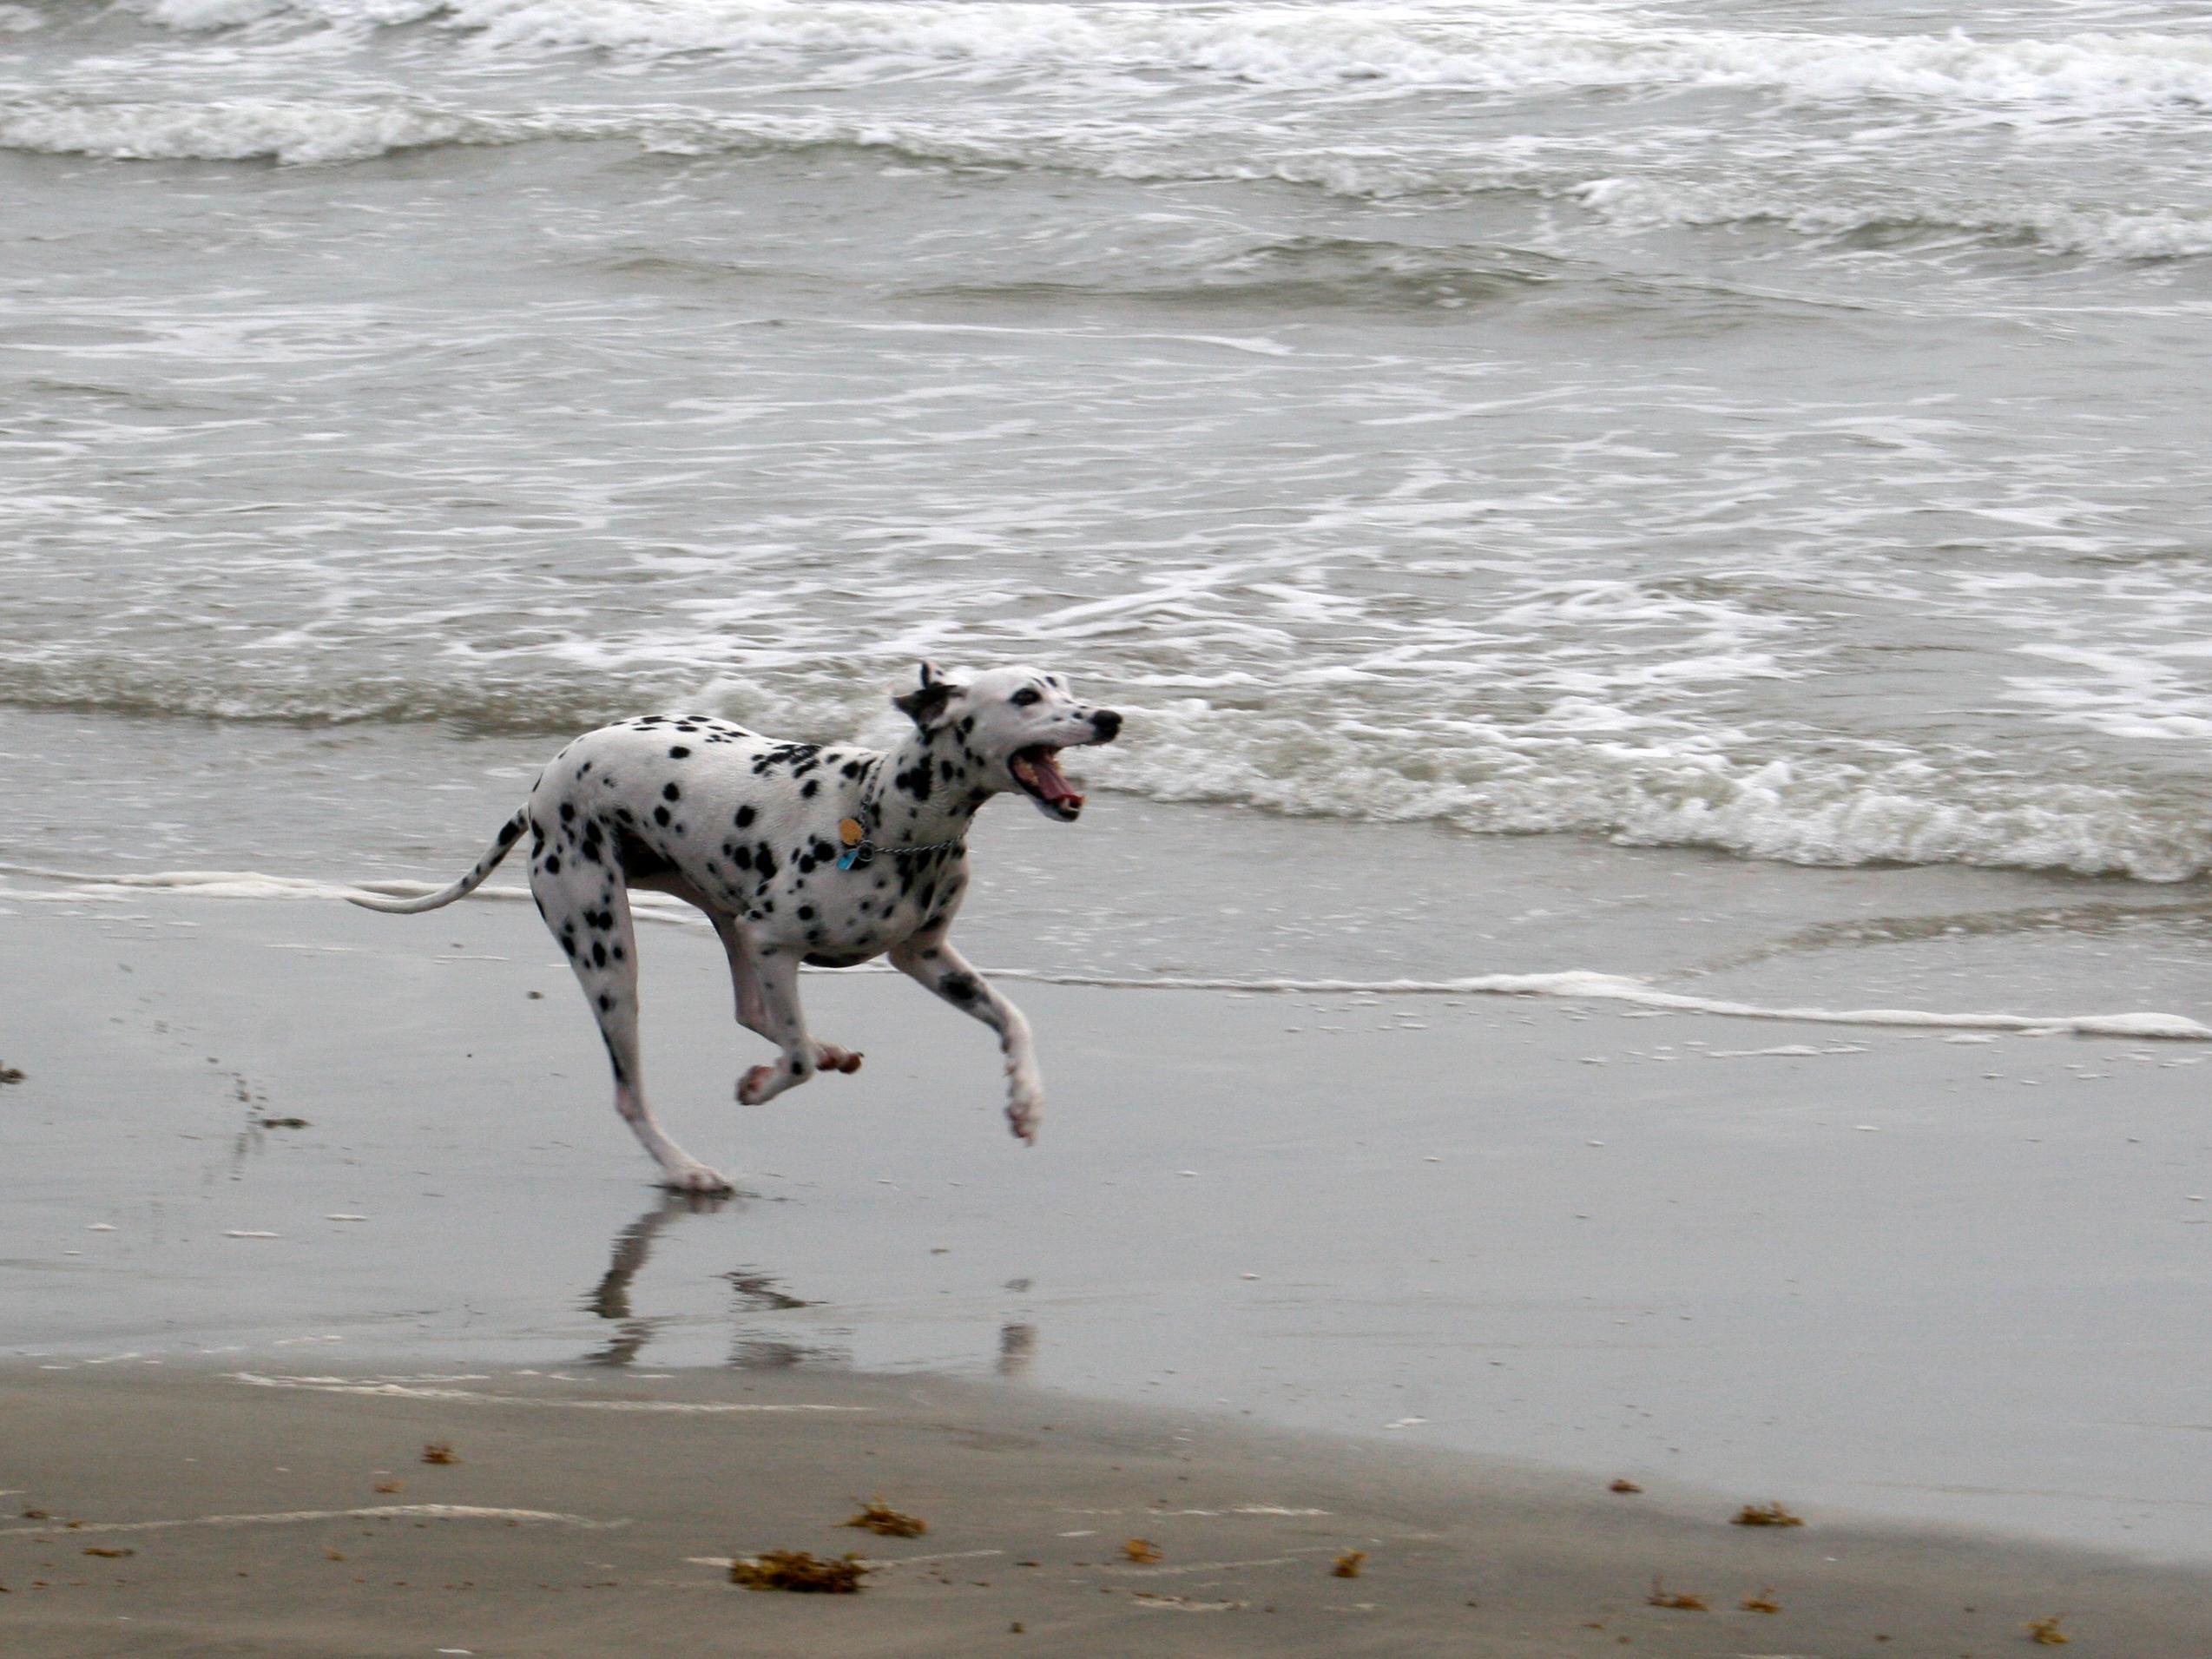 Dalmatian running on beach